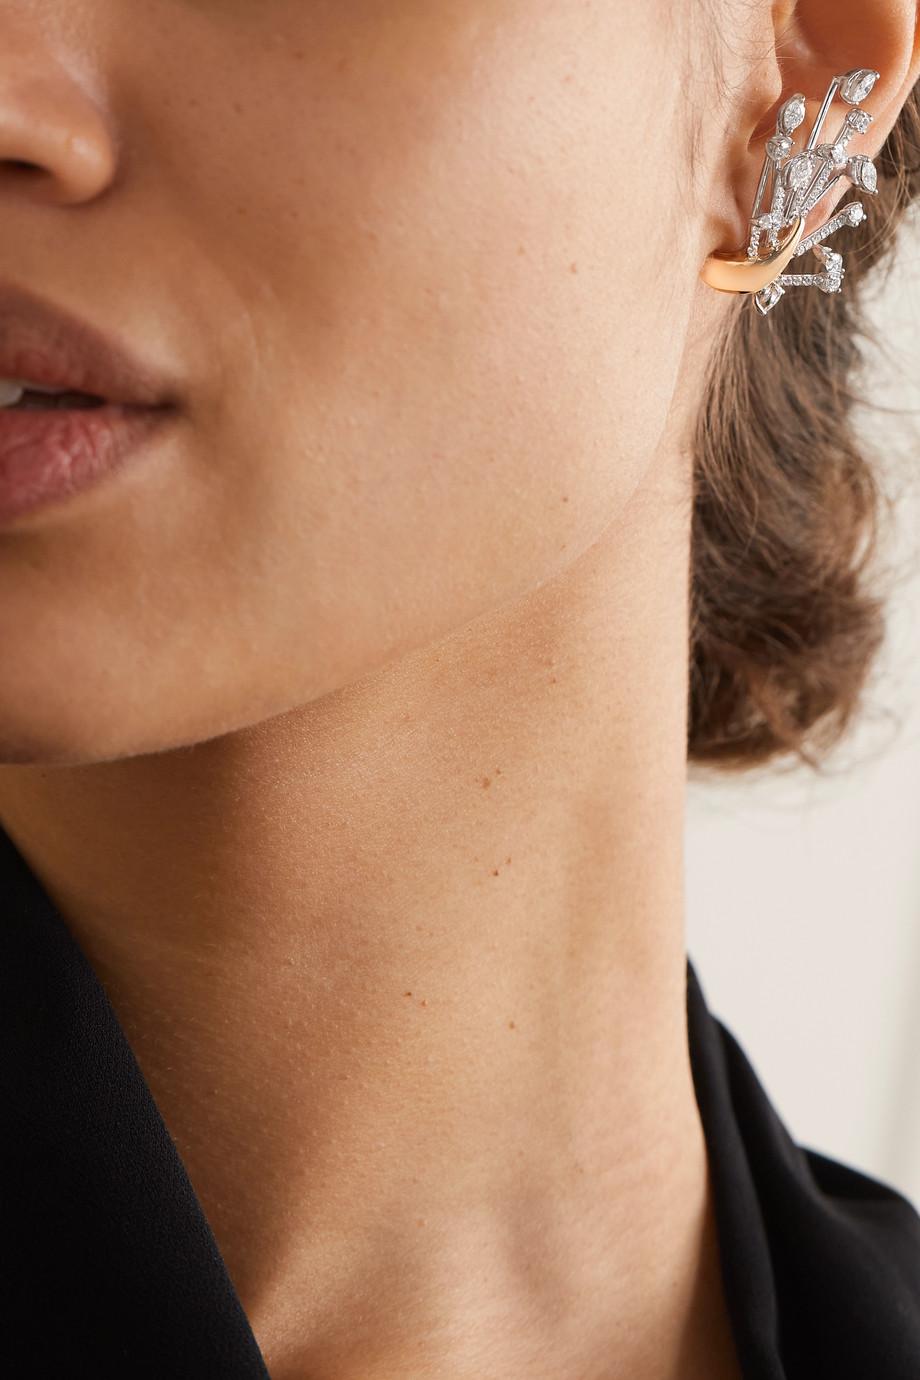 YEPREM 18-karat yellow and white gold diamond earrings